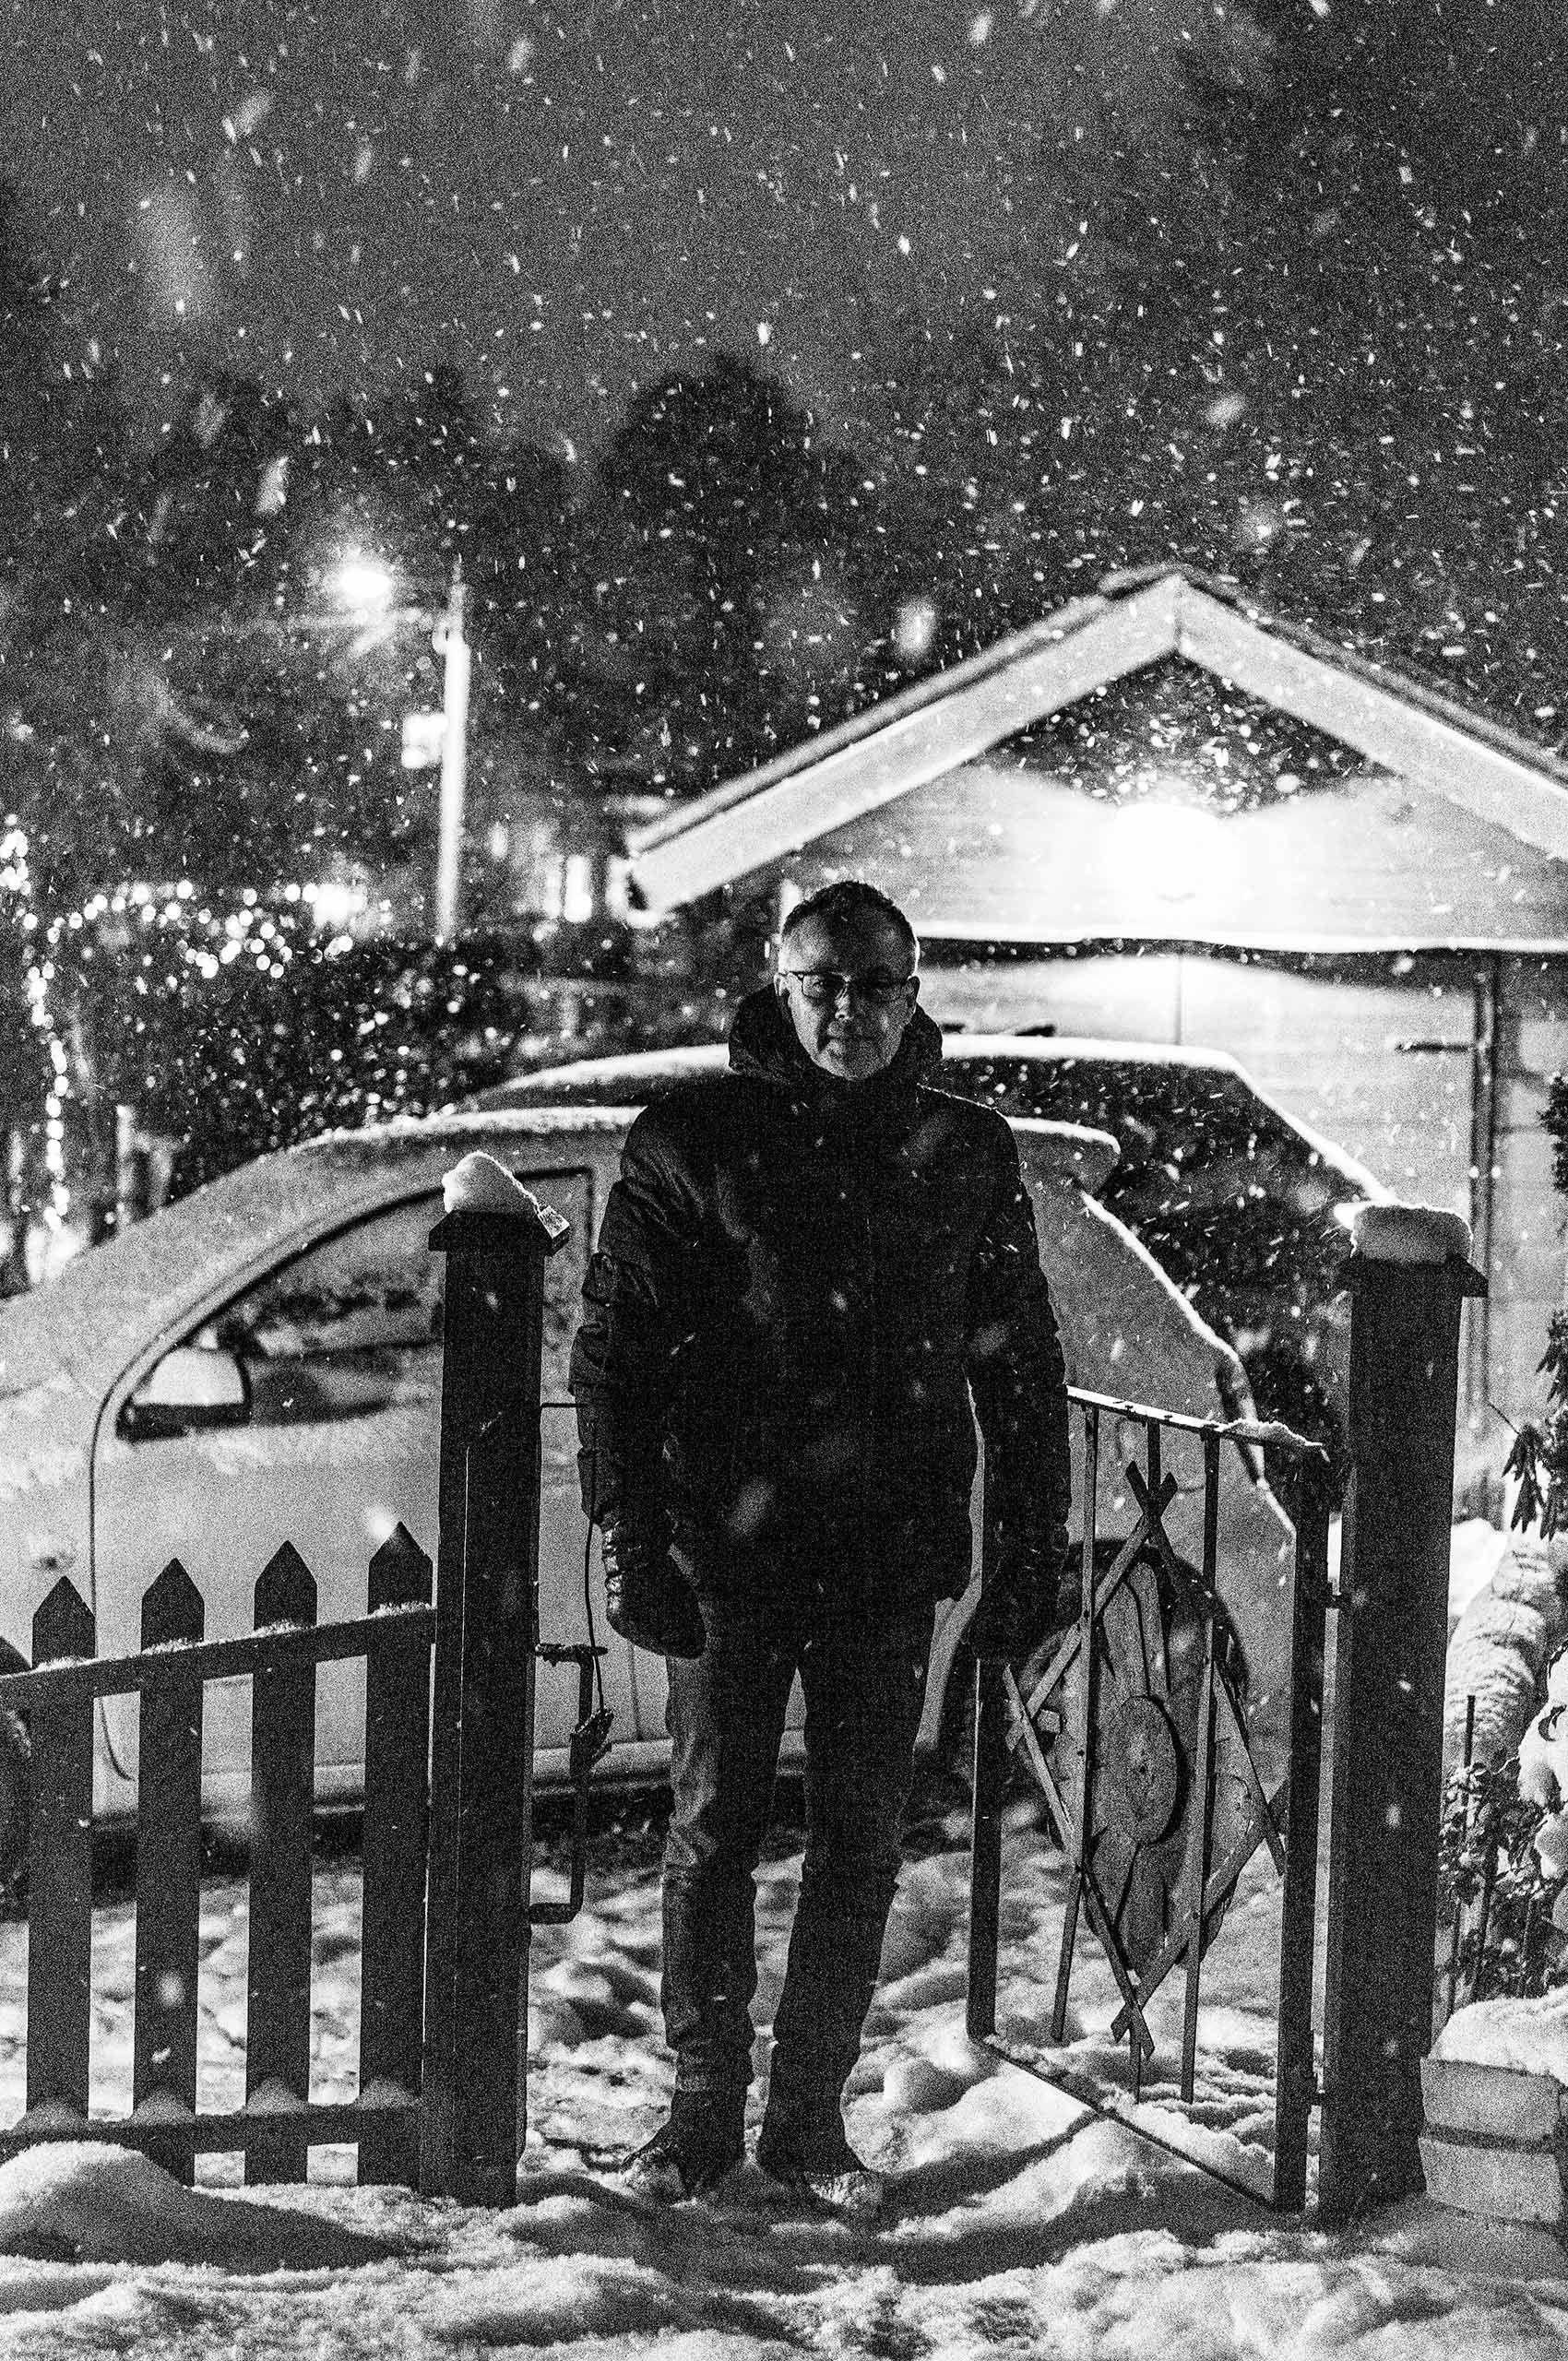 Man-Snow-HenrikOlundPhotography.jpg